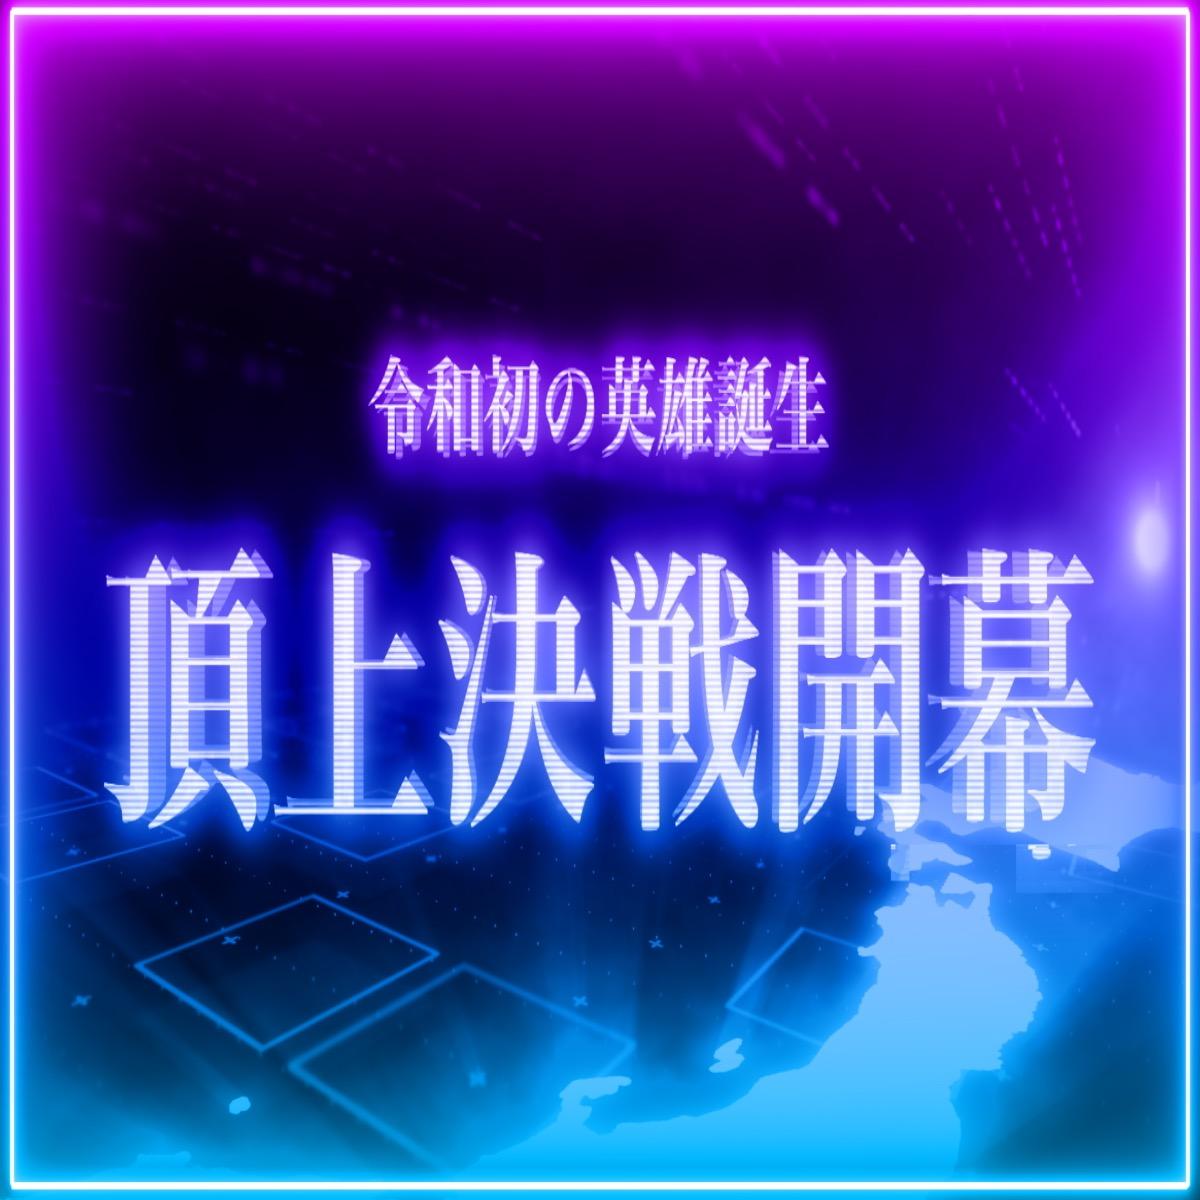 KIDS&RIZE トーナメントを大公開!!